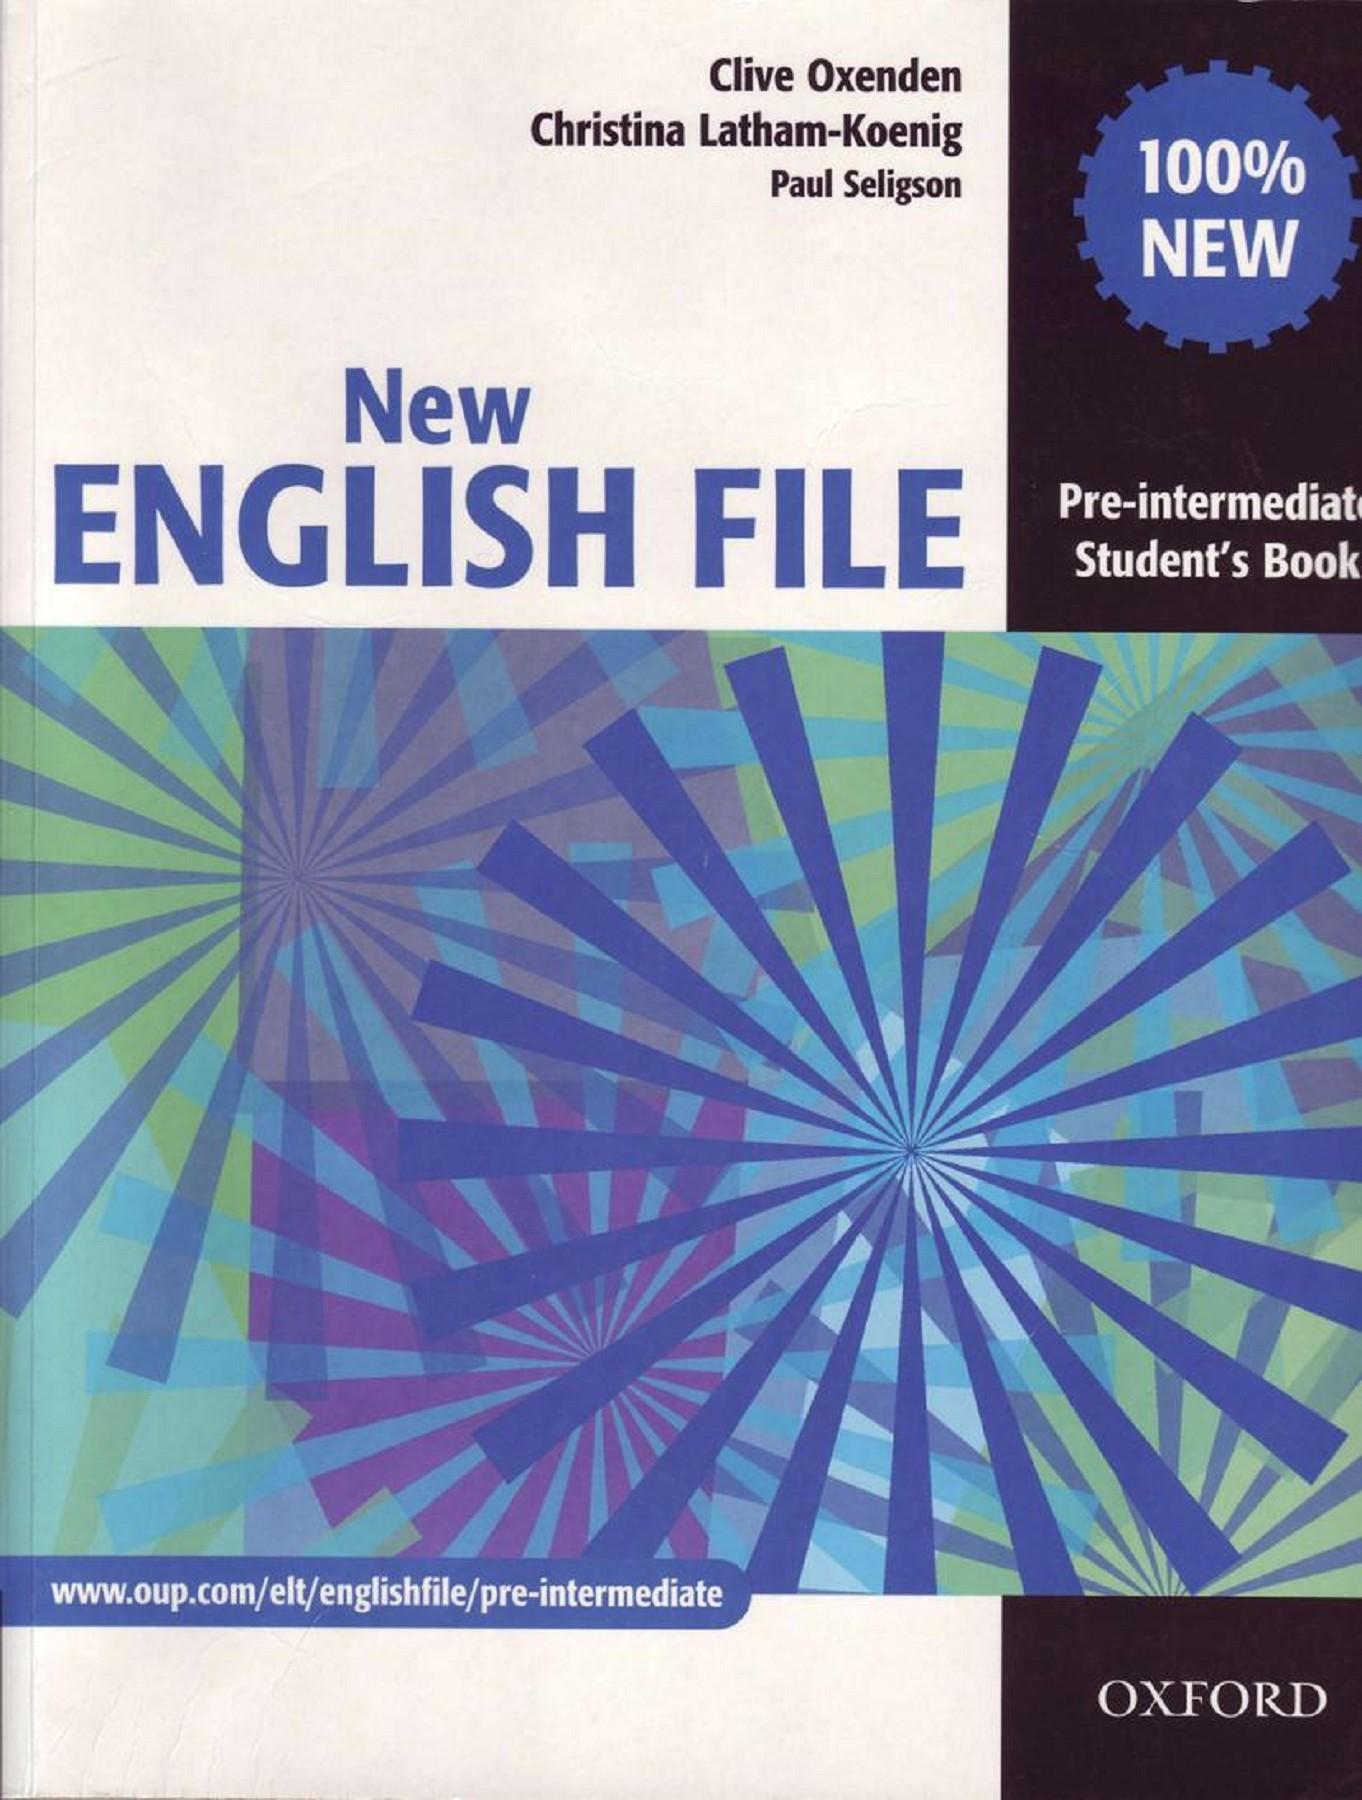 Www.oup.com/elt/englishfile : www.oup.com/elt/englishfile, English, Pre-Intermediate, Student's